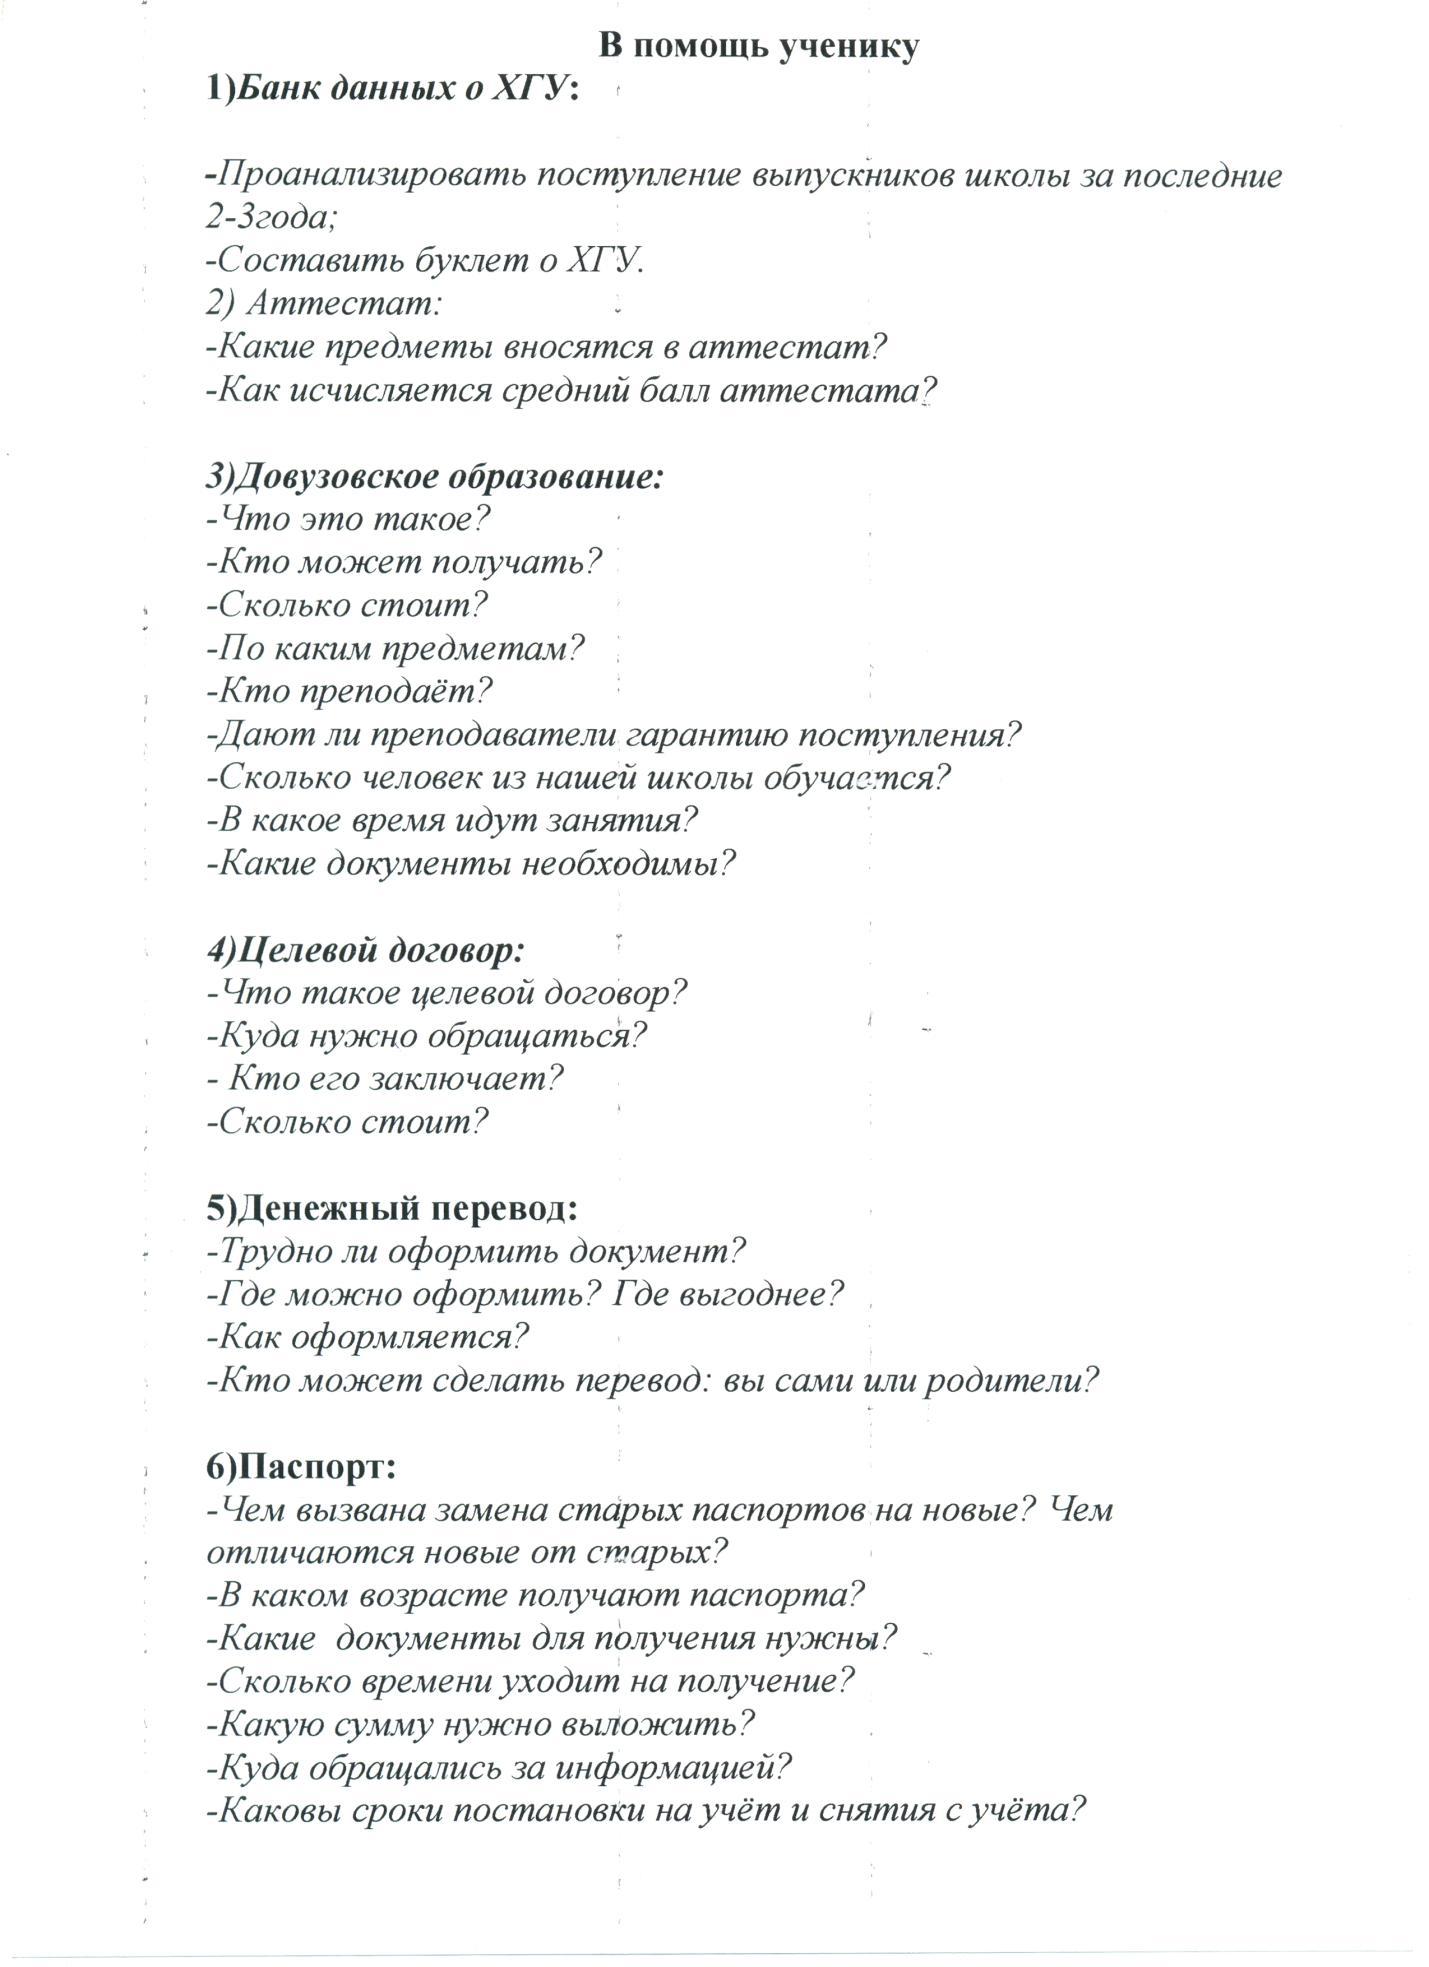 hello_html_m6f714dce.jpg